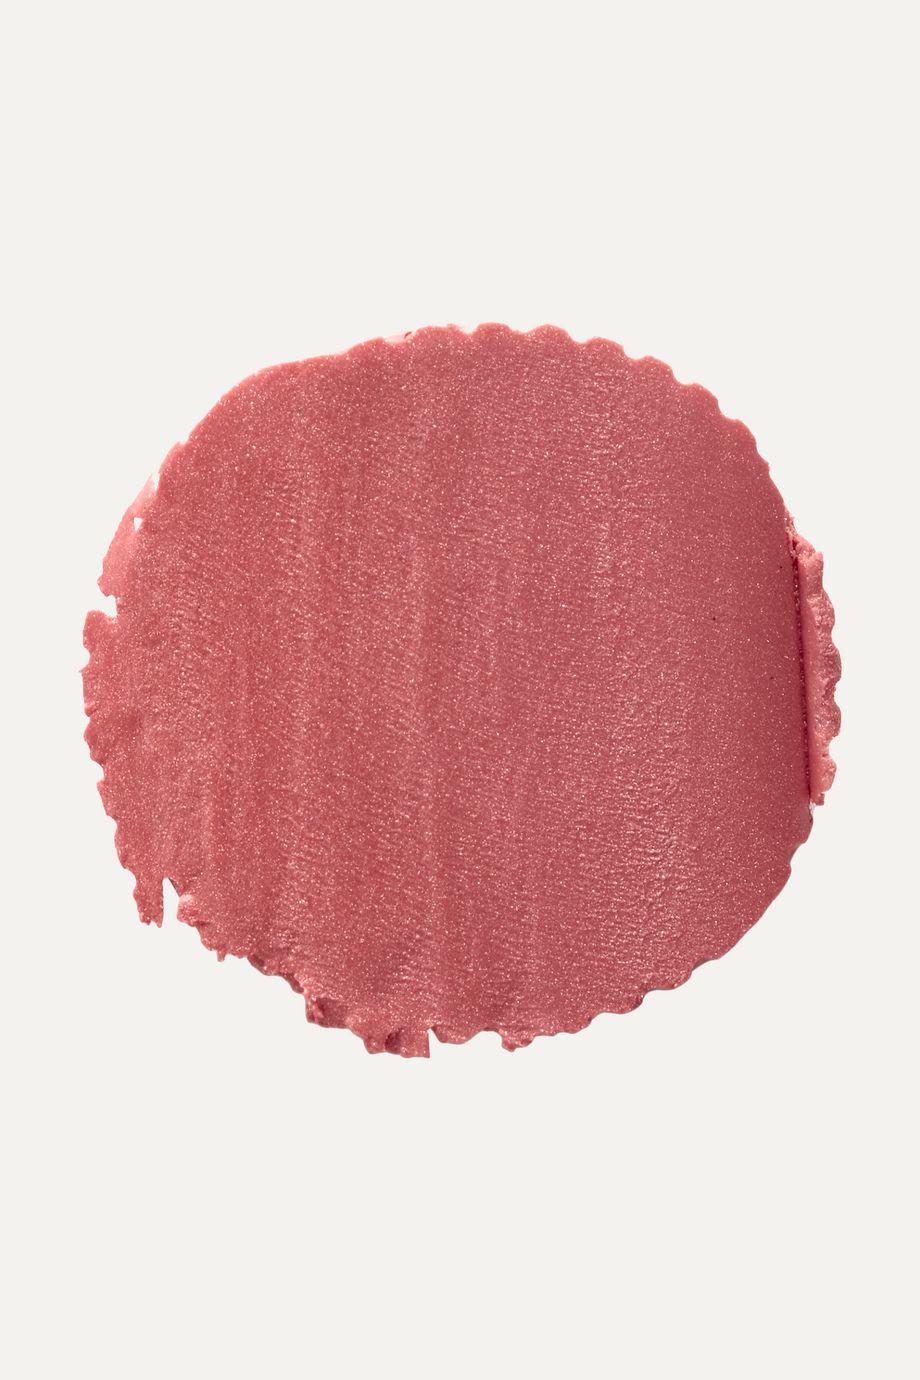 Burberry Beauty Full Kisses - English Rose No.529